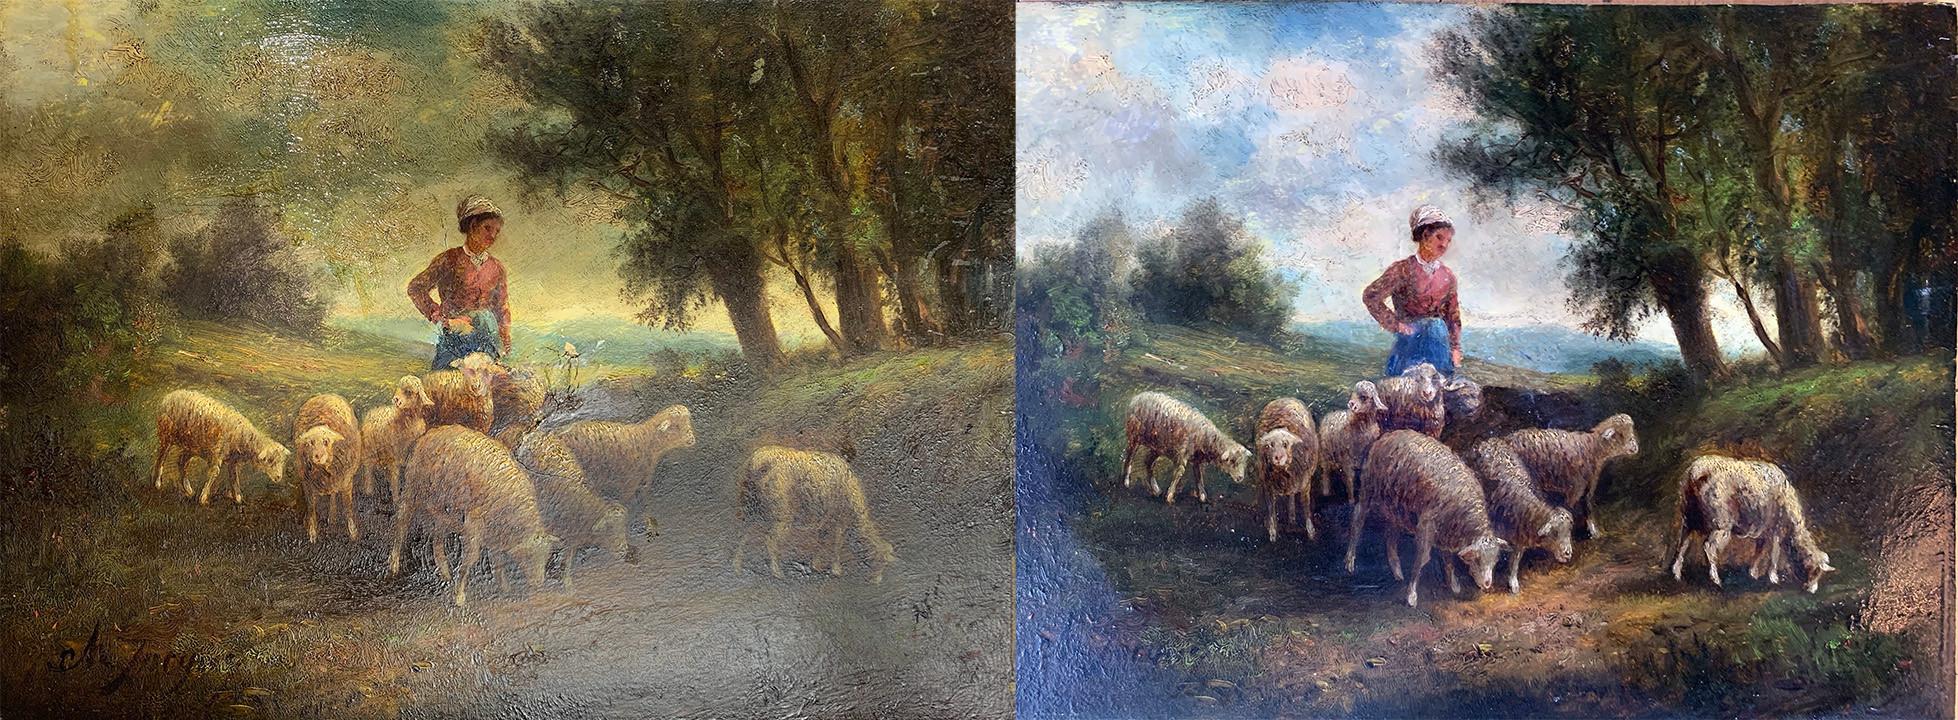 Lady and Sheep.jpg